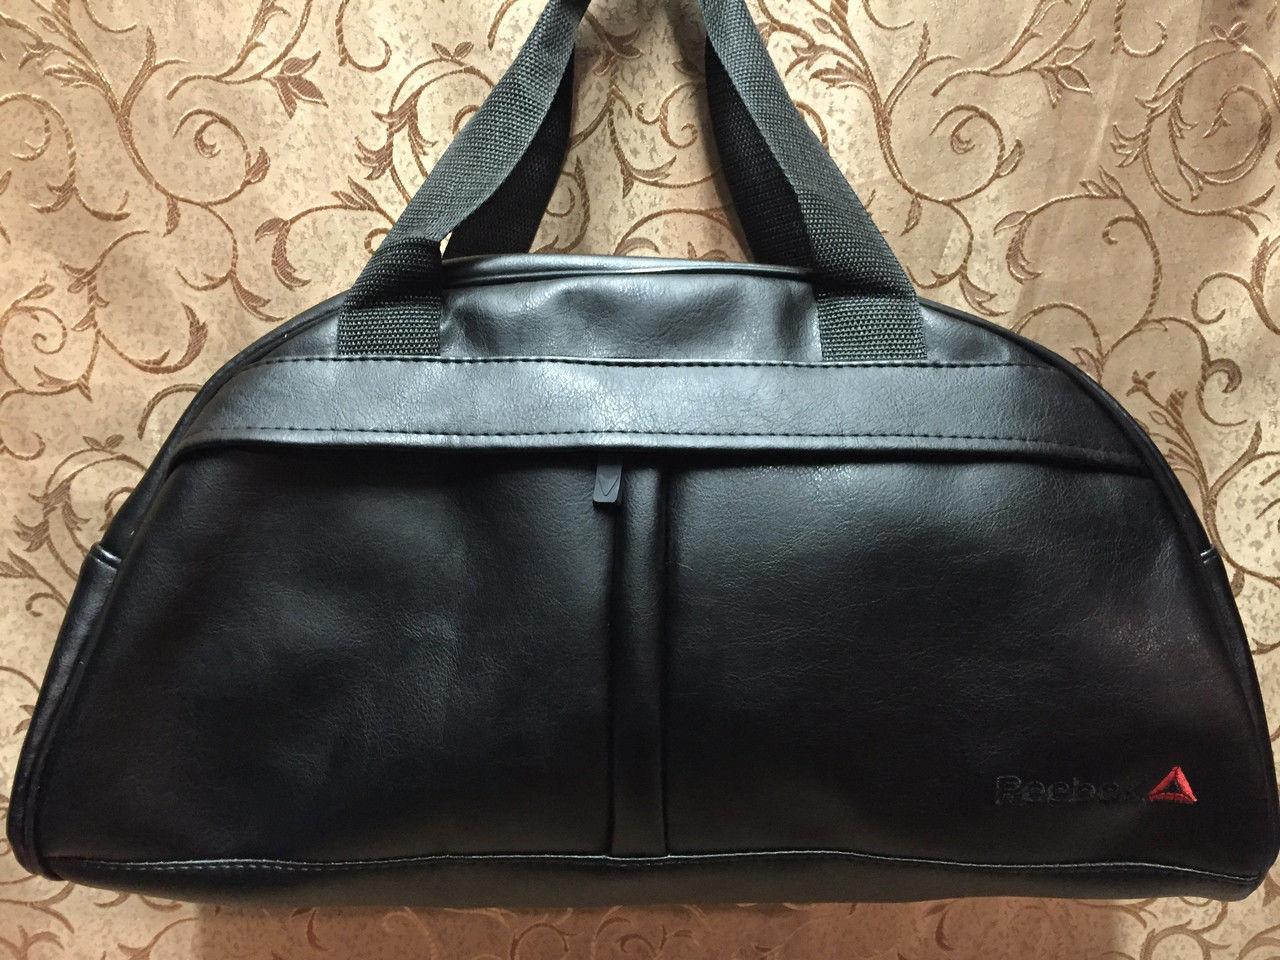 0b4ccf34 Спортивная сумка Reebok из чёрного кожзама, Рибок: продажа, цена в ...